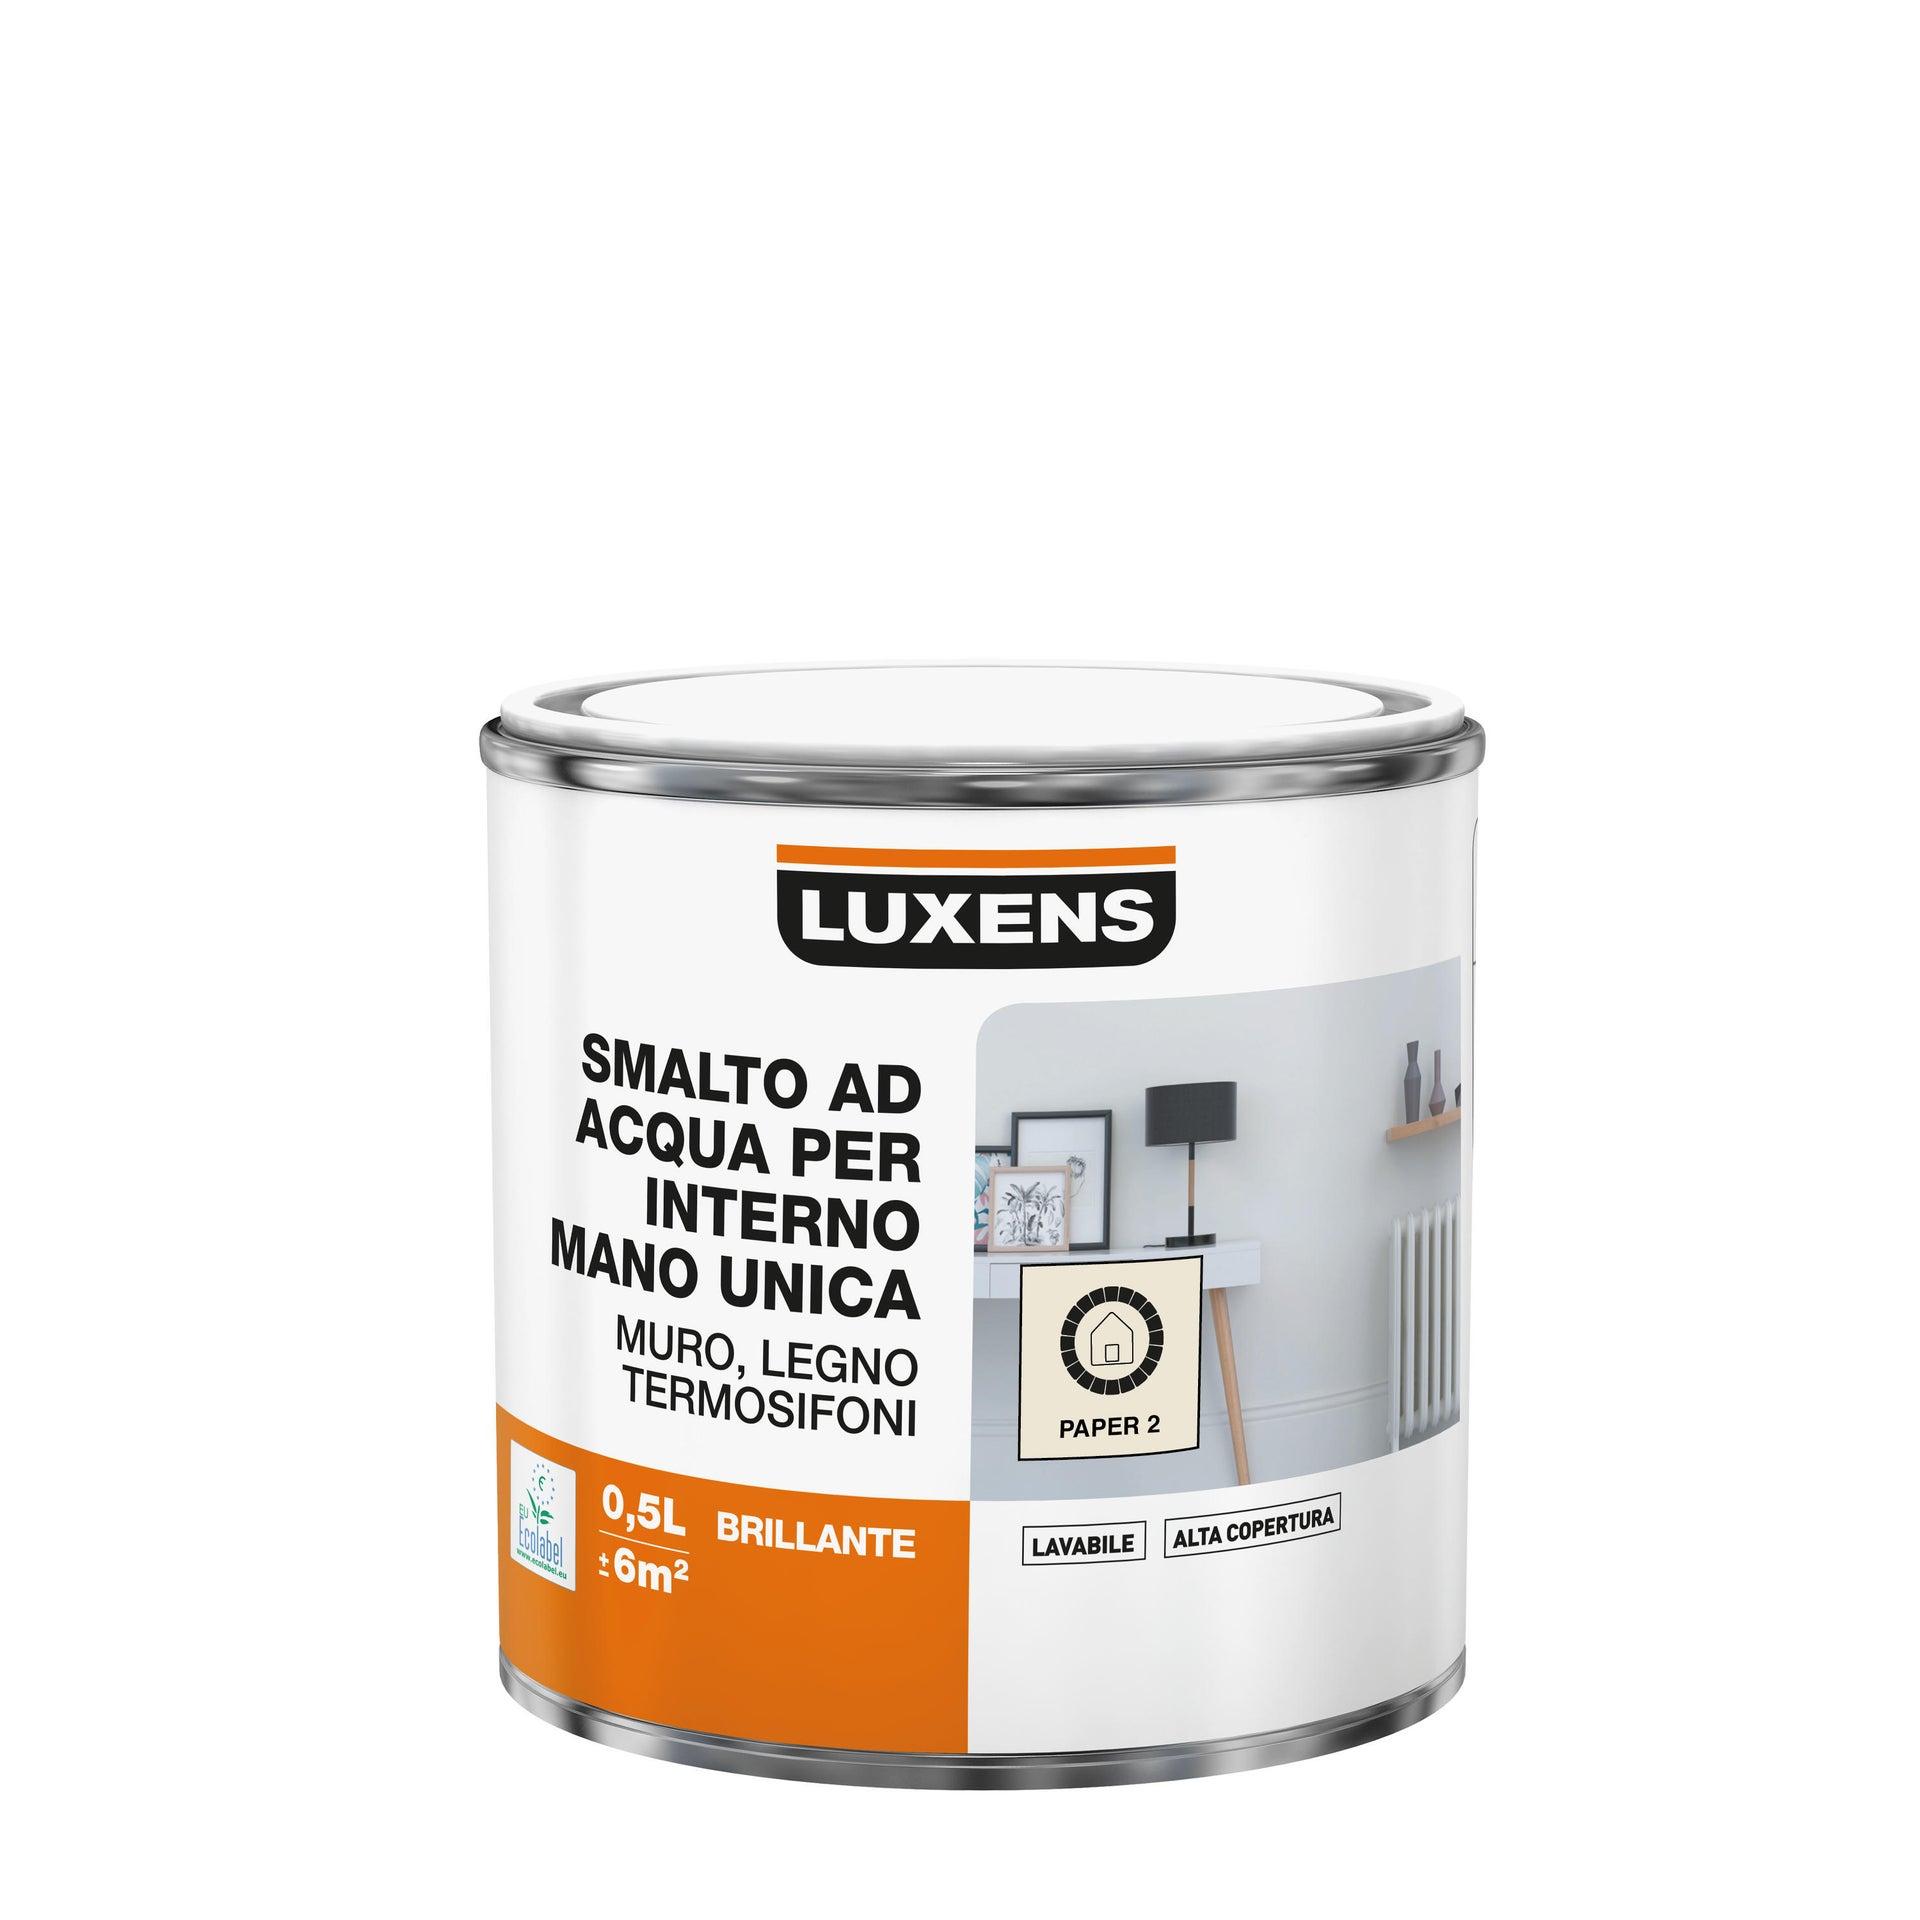 Vernice di finitura LUXENS Manounica base acqua bianco paper 2 lucido 0.5 L - 2